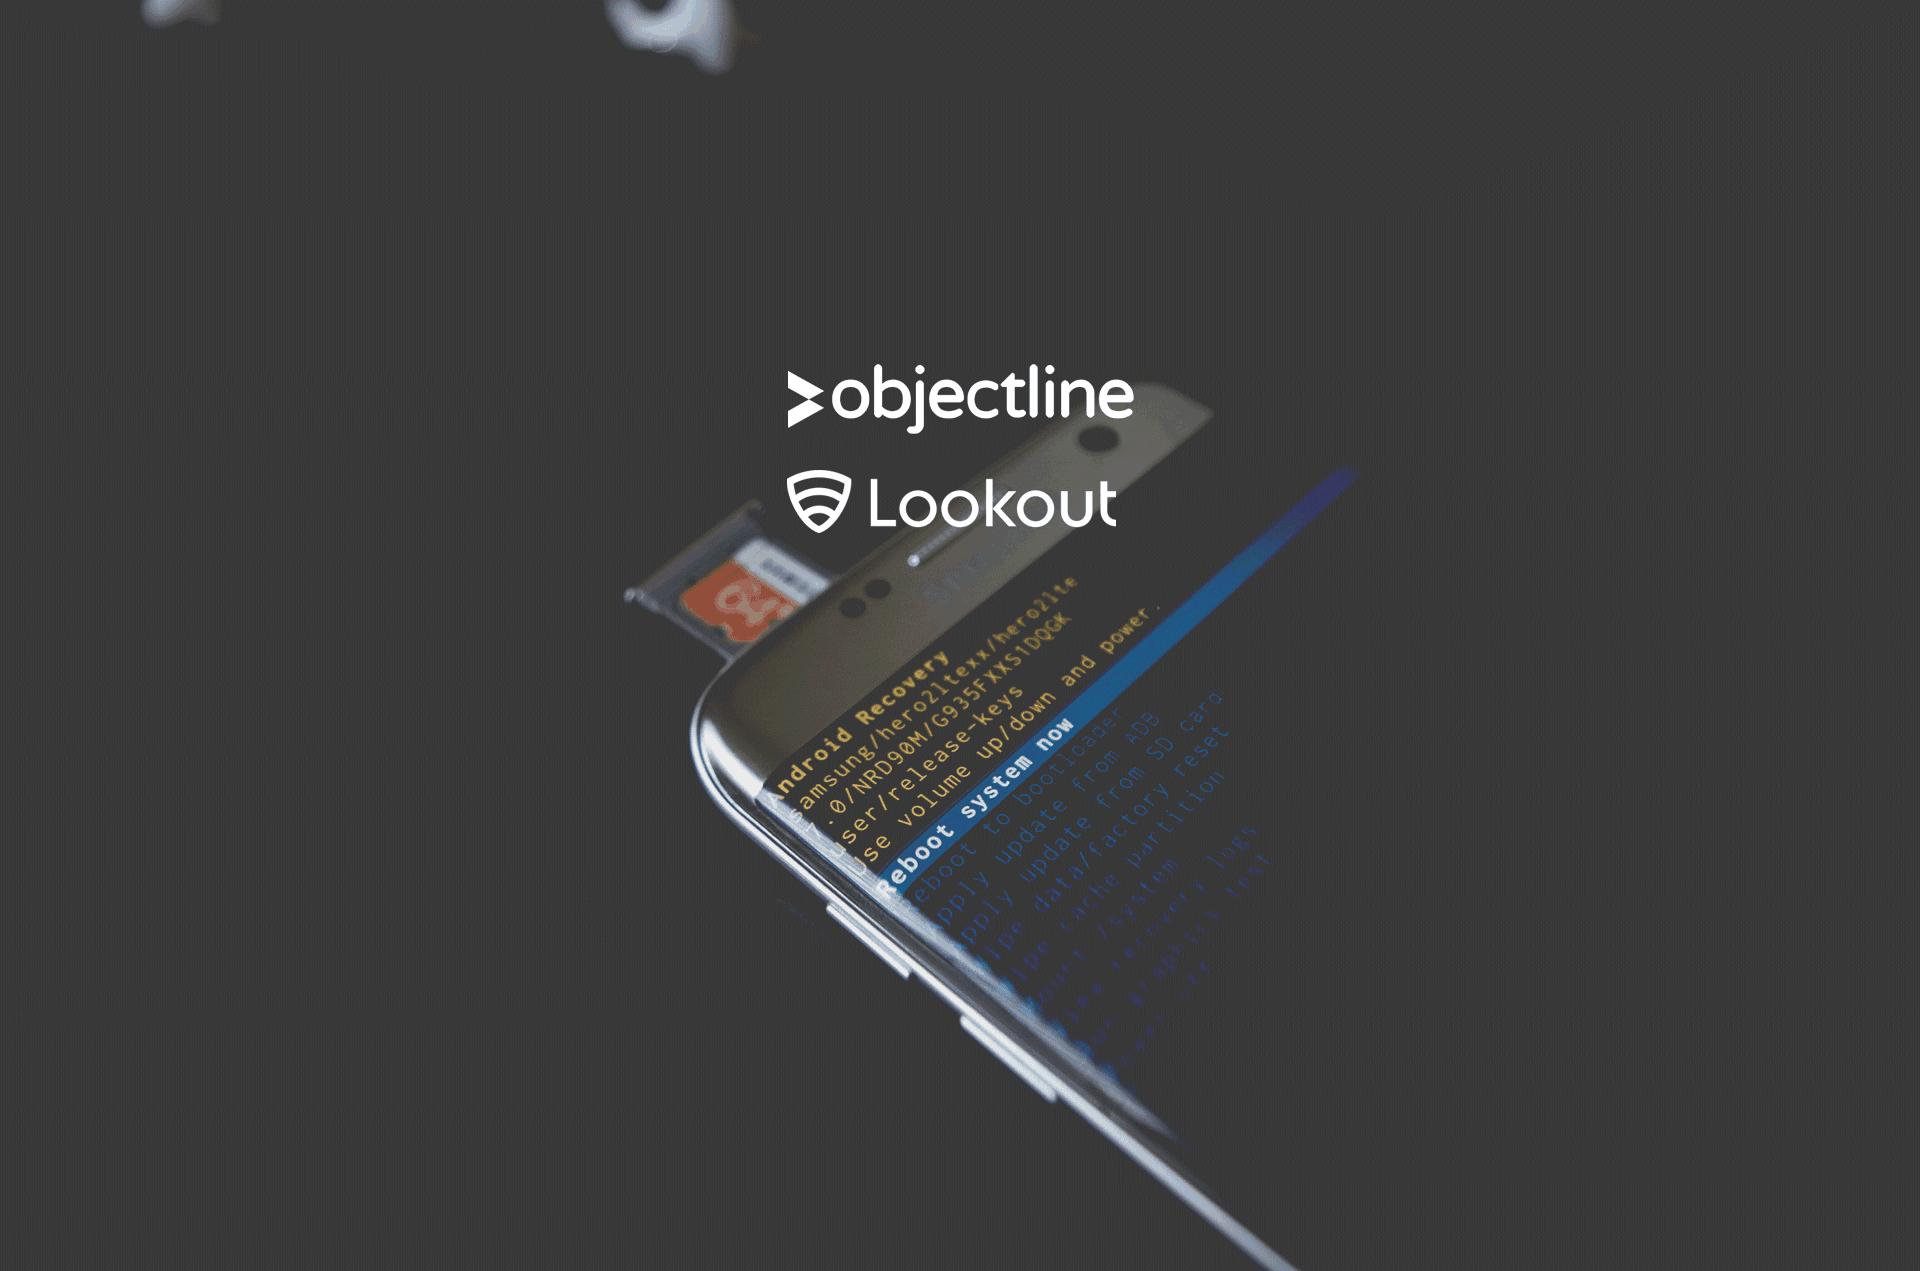 objectline lookout données mobiles